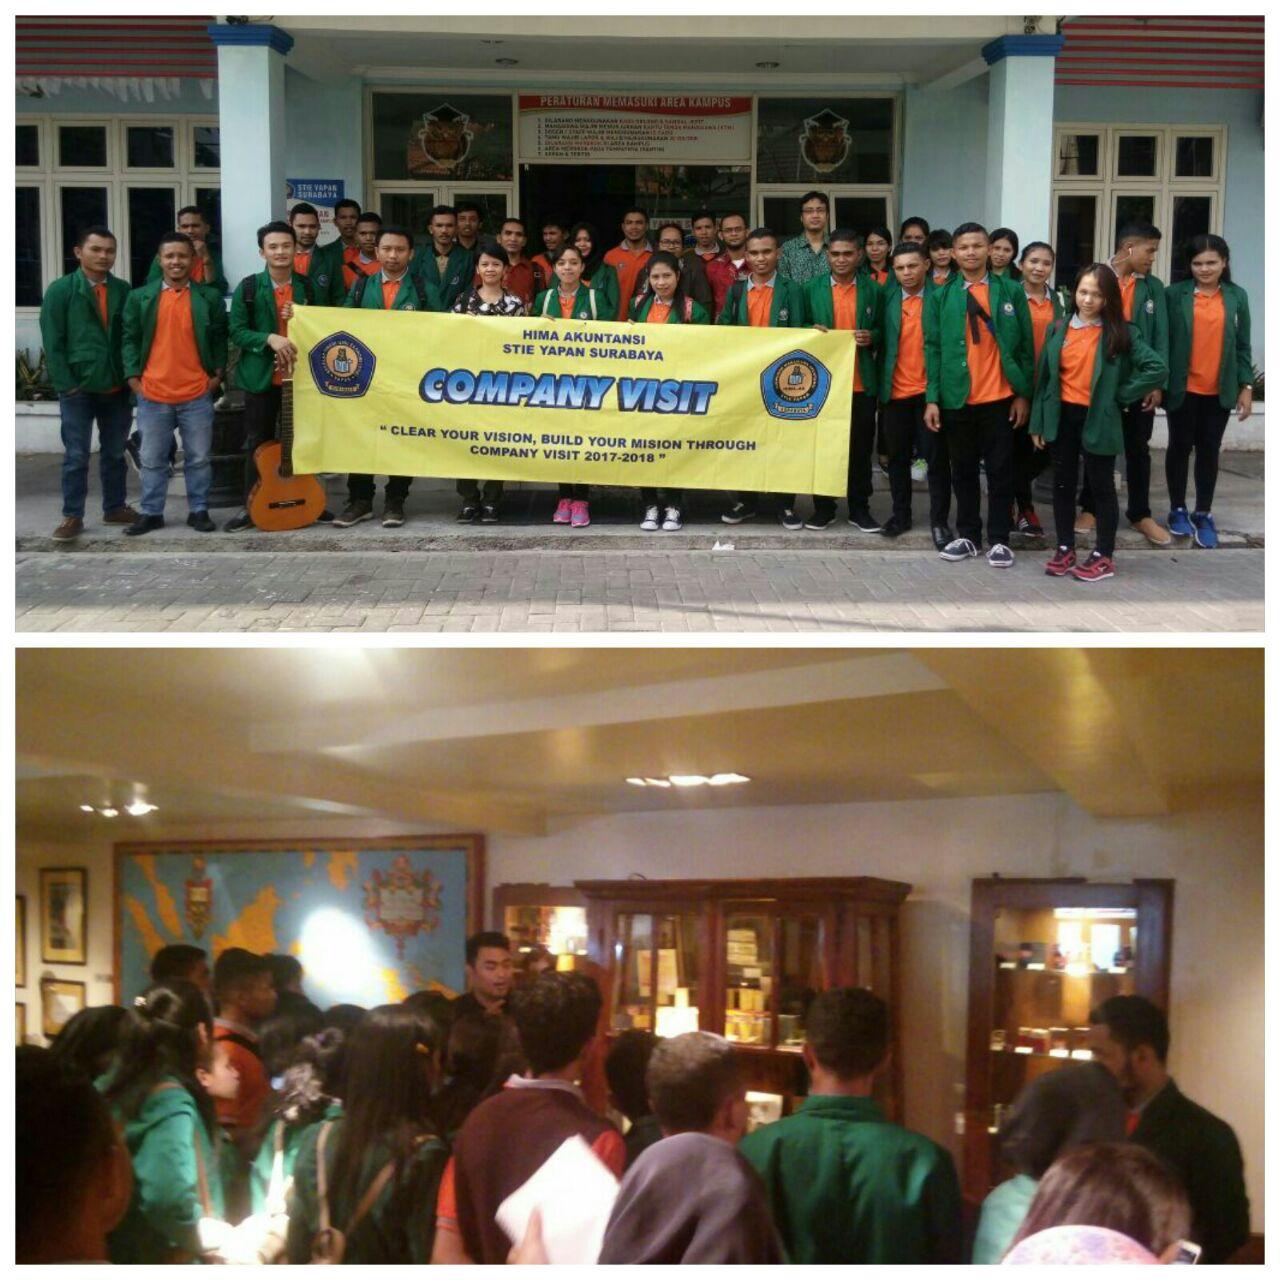 Company Visit Mahasiswa Prodi Akuntansi STIE YAPAN ke House Of Sampoerna – Surabaya